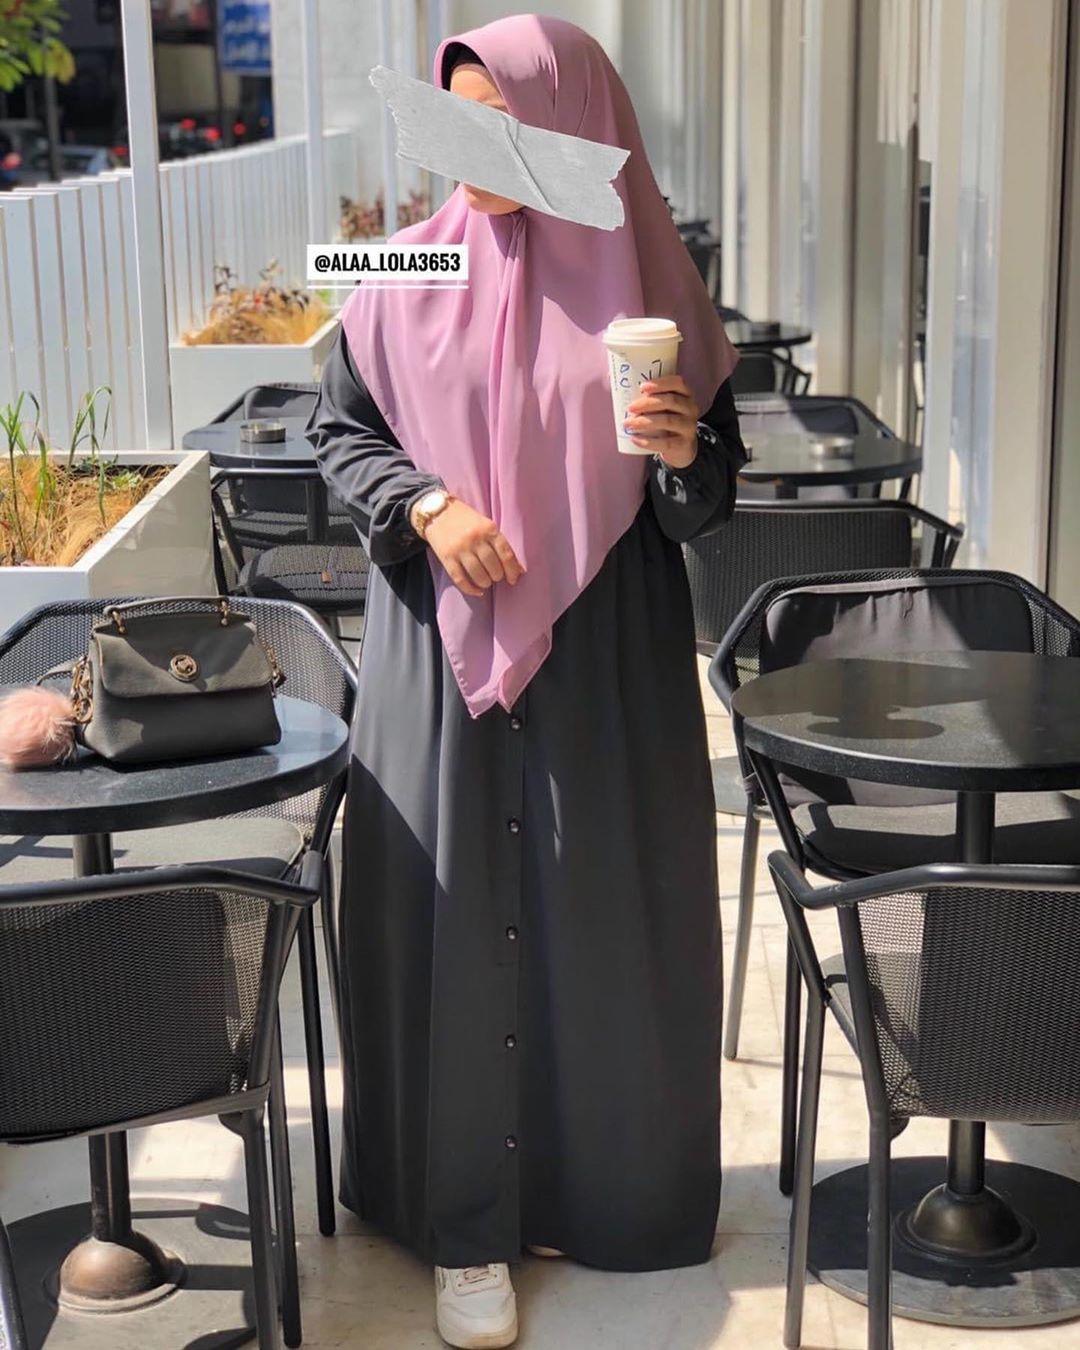 190 Likes 0 Comments Alaa Doaa Design Twinz Shop1 On Instagram متوفر الآن جلباب كود ١٦ بلون رمادي واسود للط Street Hijab Fashion Street Hijab Fashion